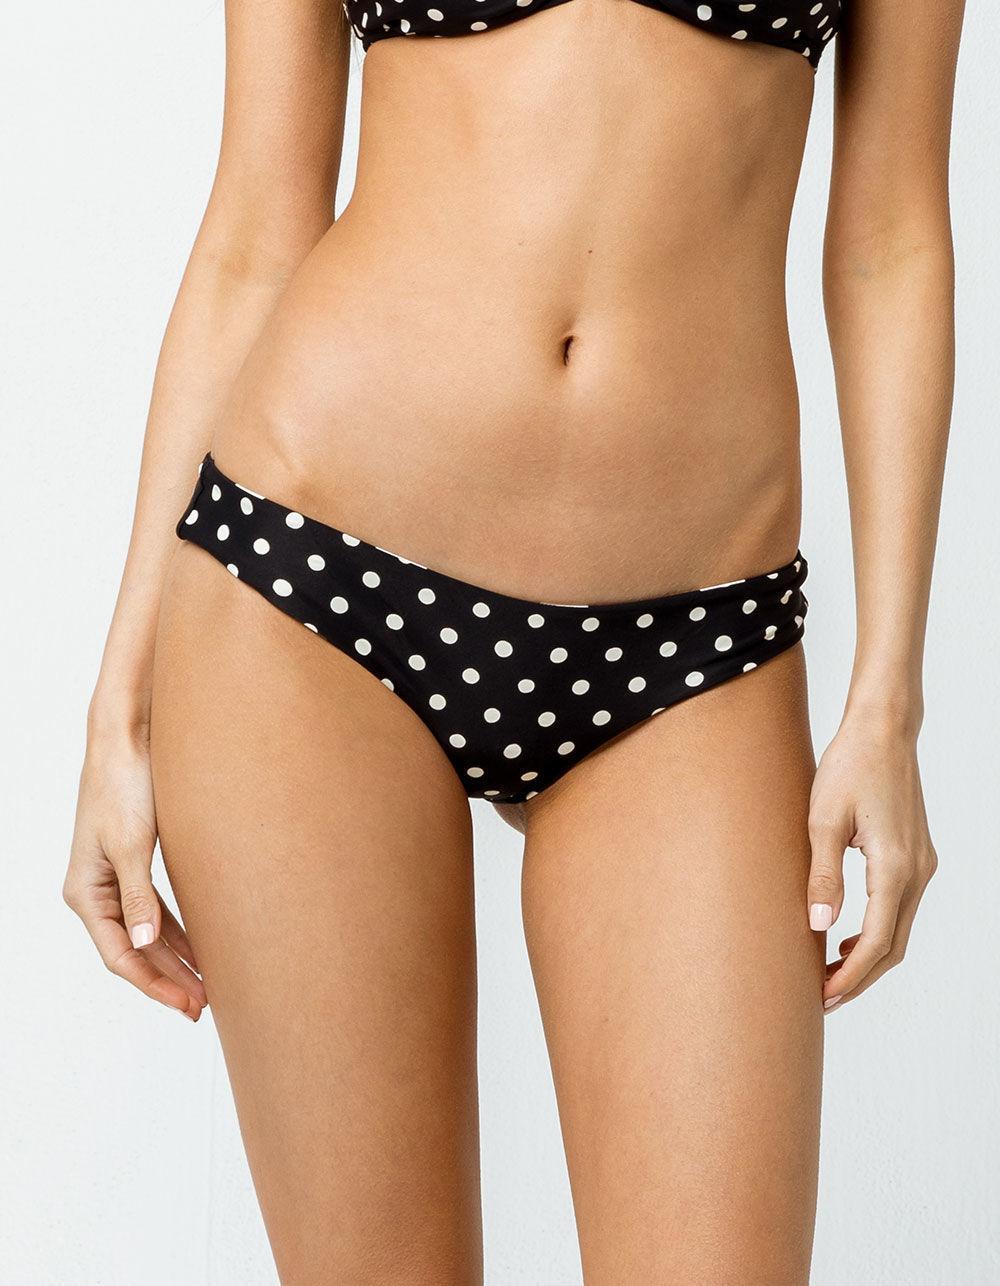 1ac53e1b882 Tap to visit site. Billabong - Black True That Hawaii Lo Reversible Cheeky  Bikini Bottoms ...